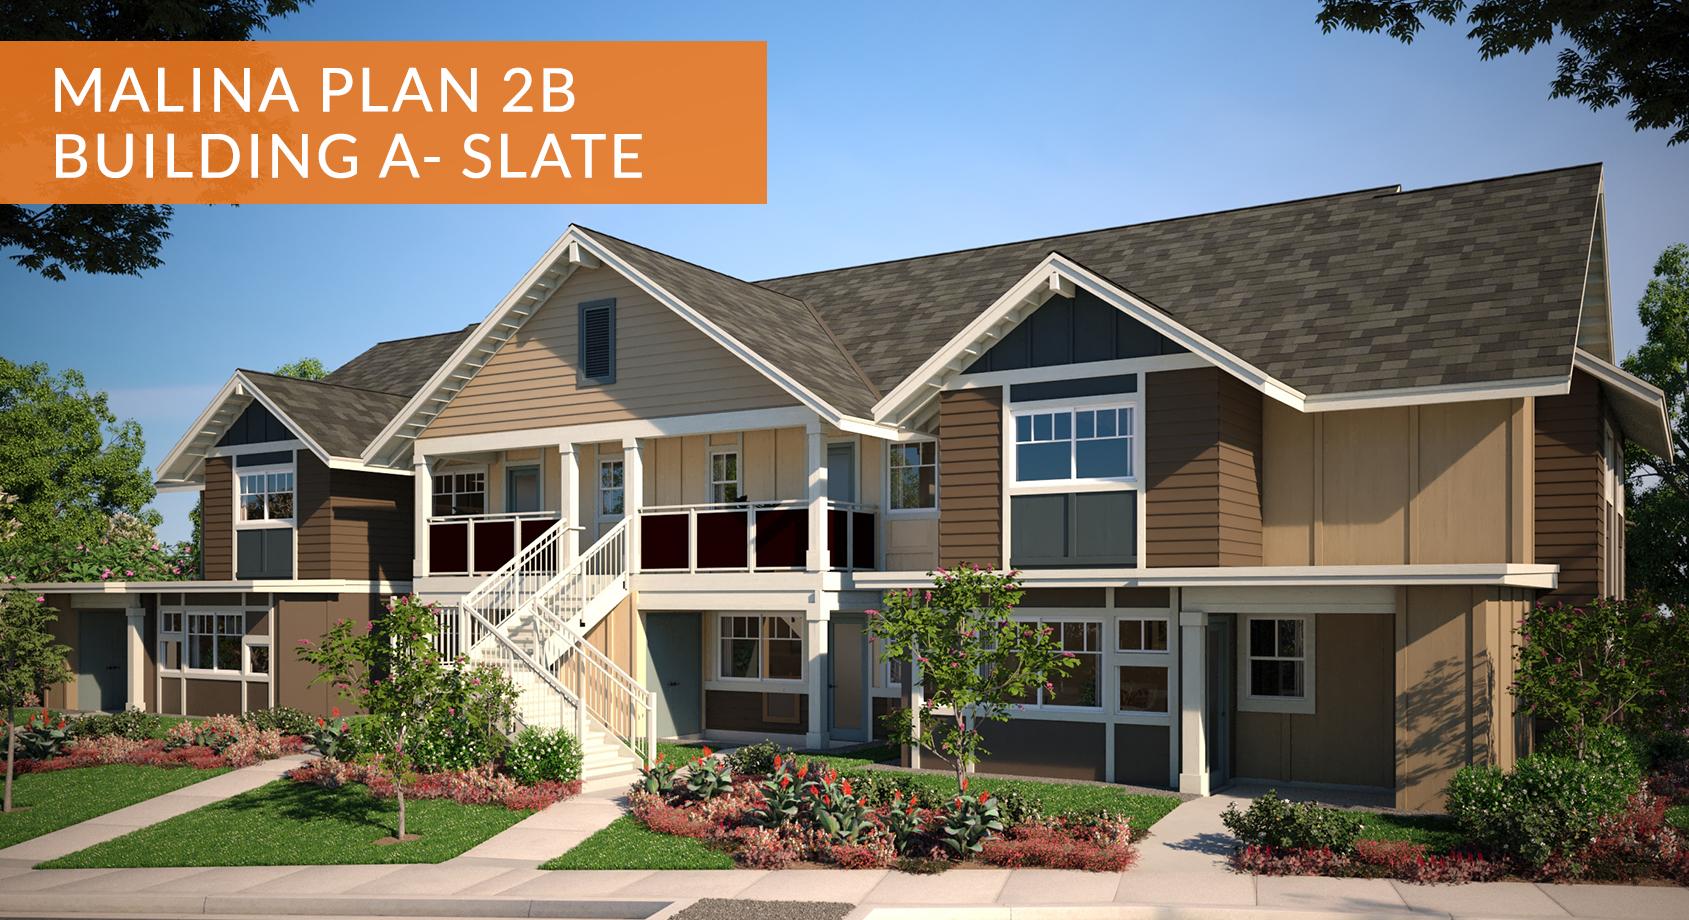 Malina at Koa Ridge Plan 2B1 - Building A Slate